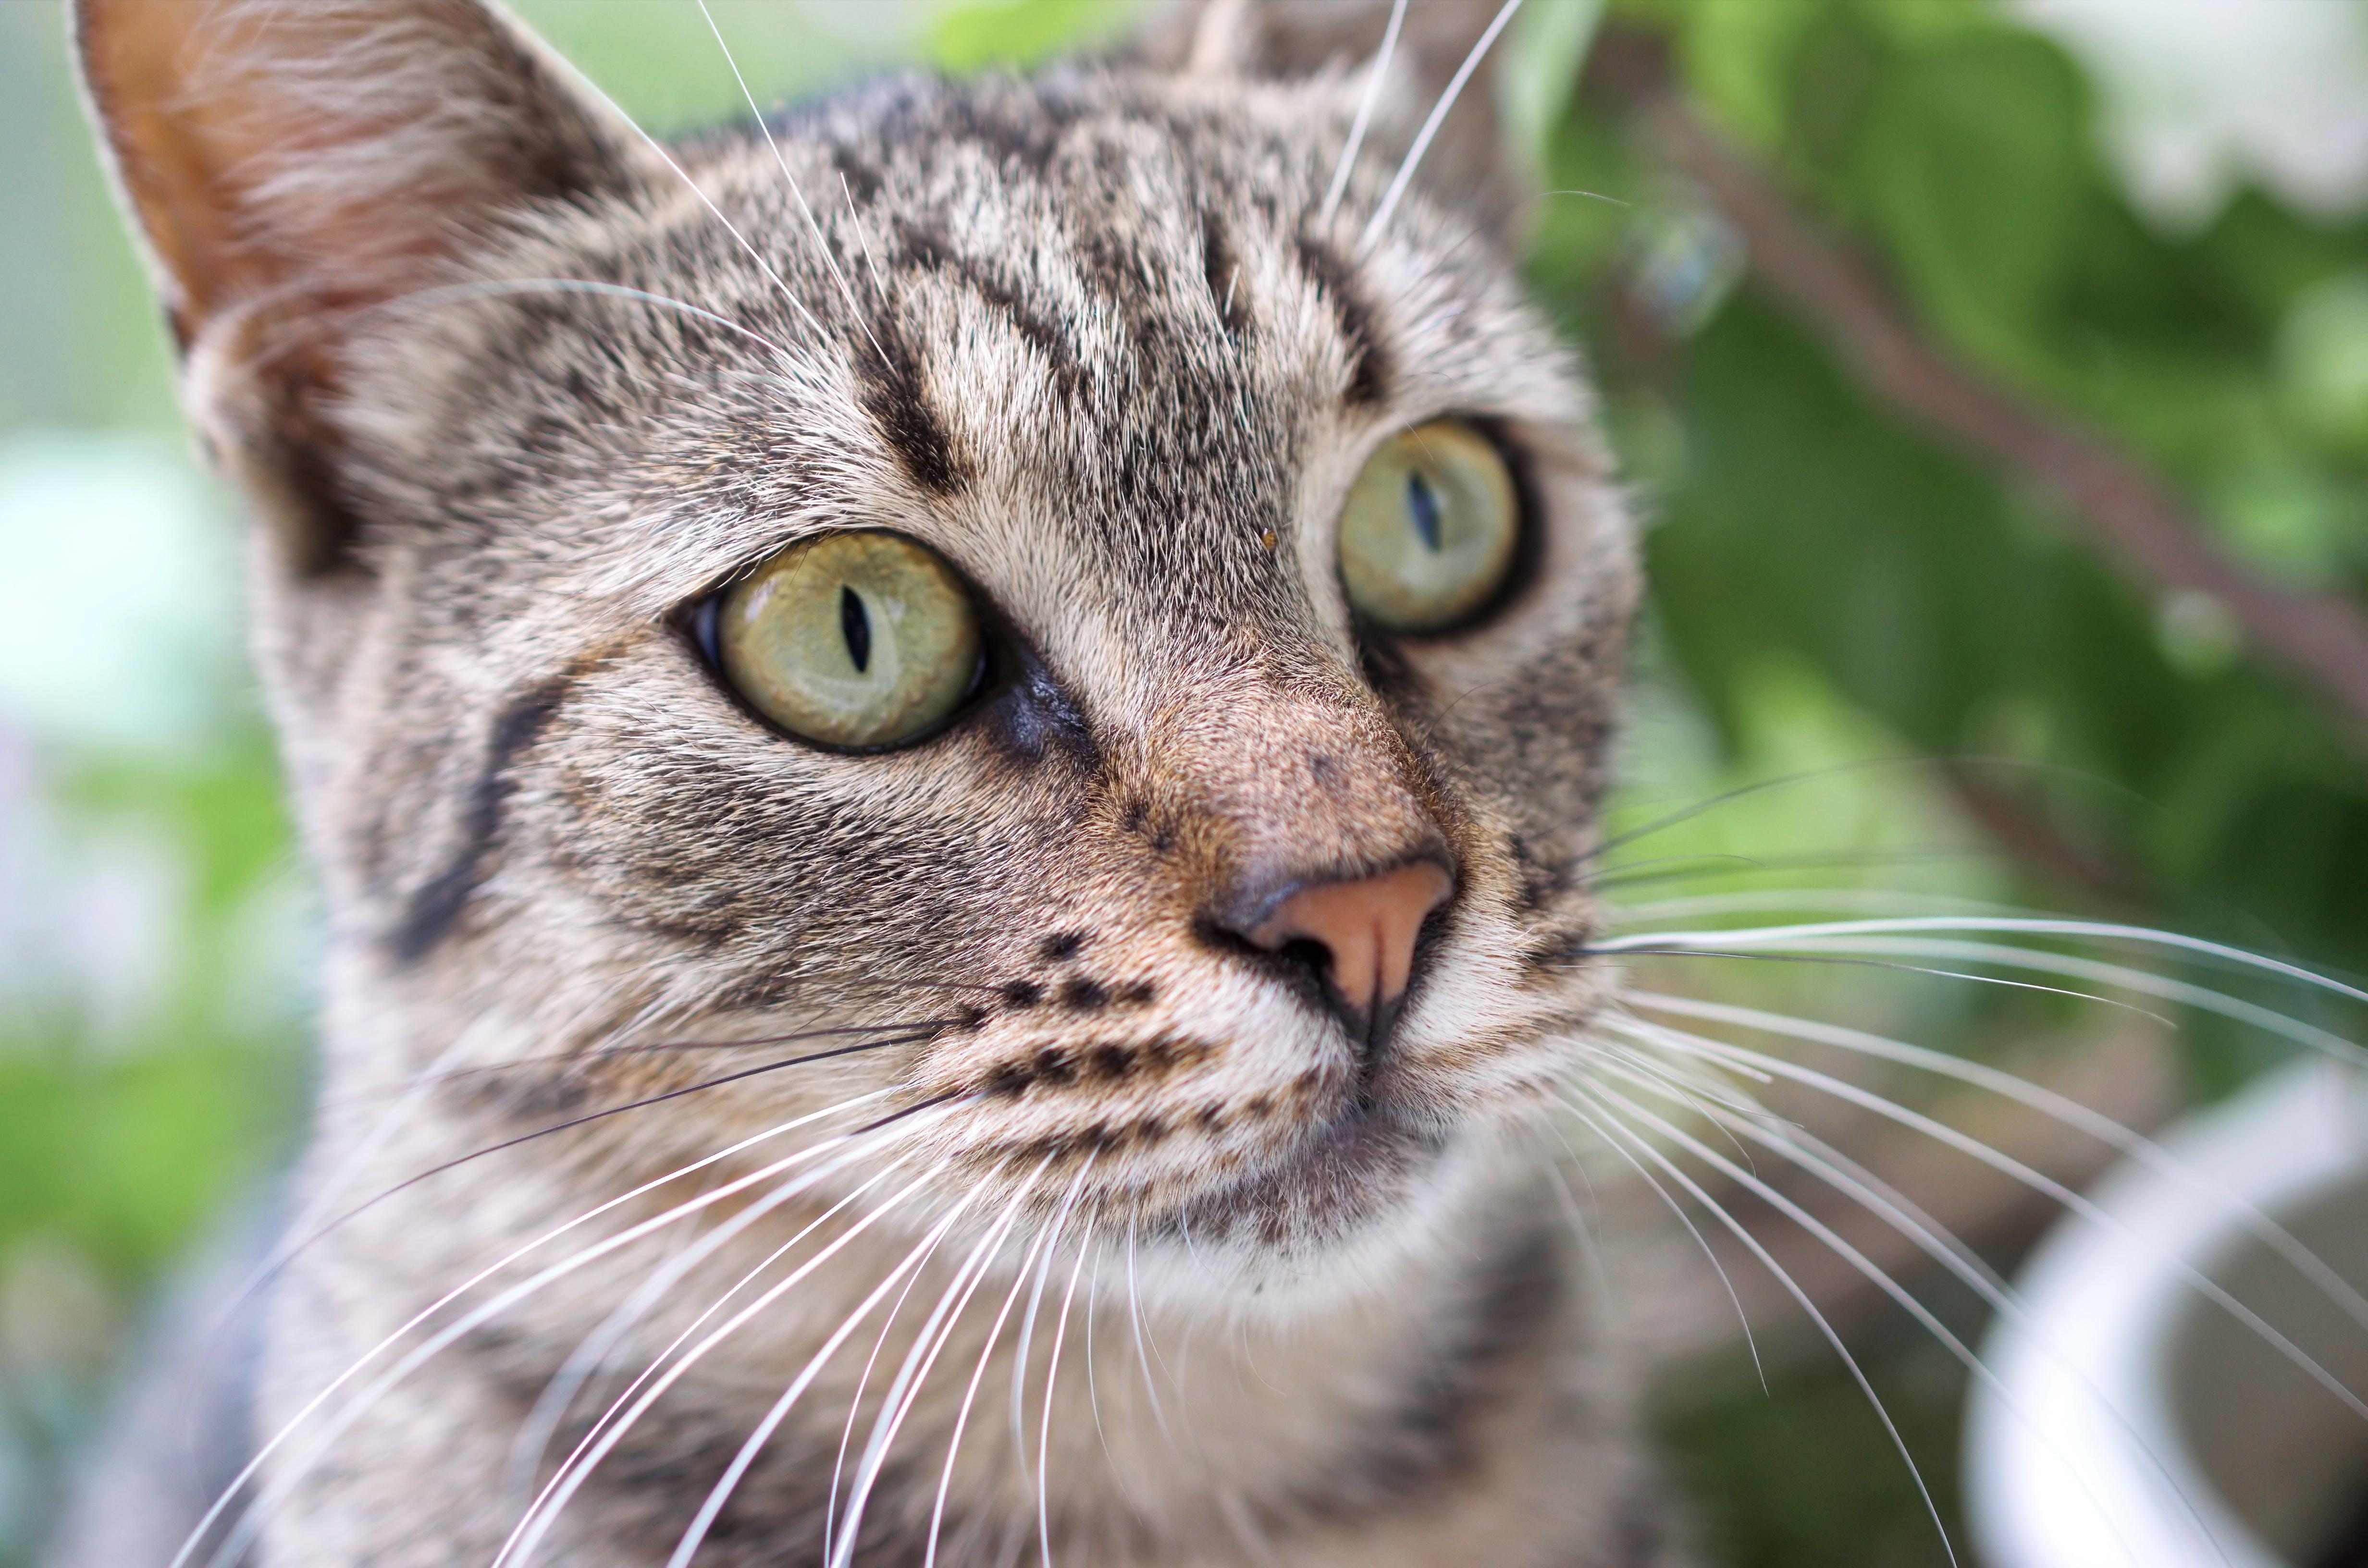 Tilt Shift Photography of Brown Tabby Cat